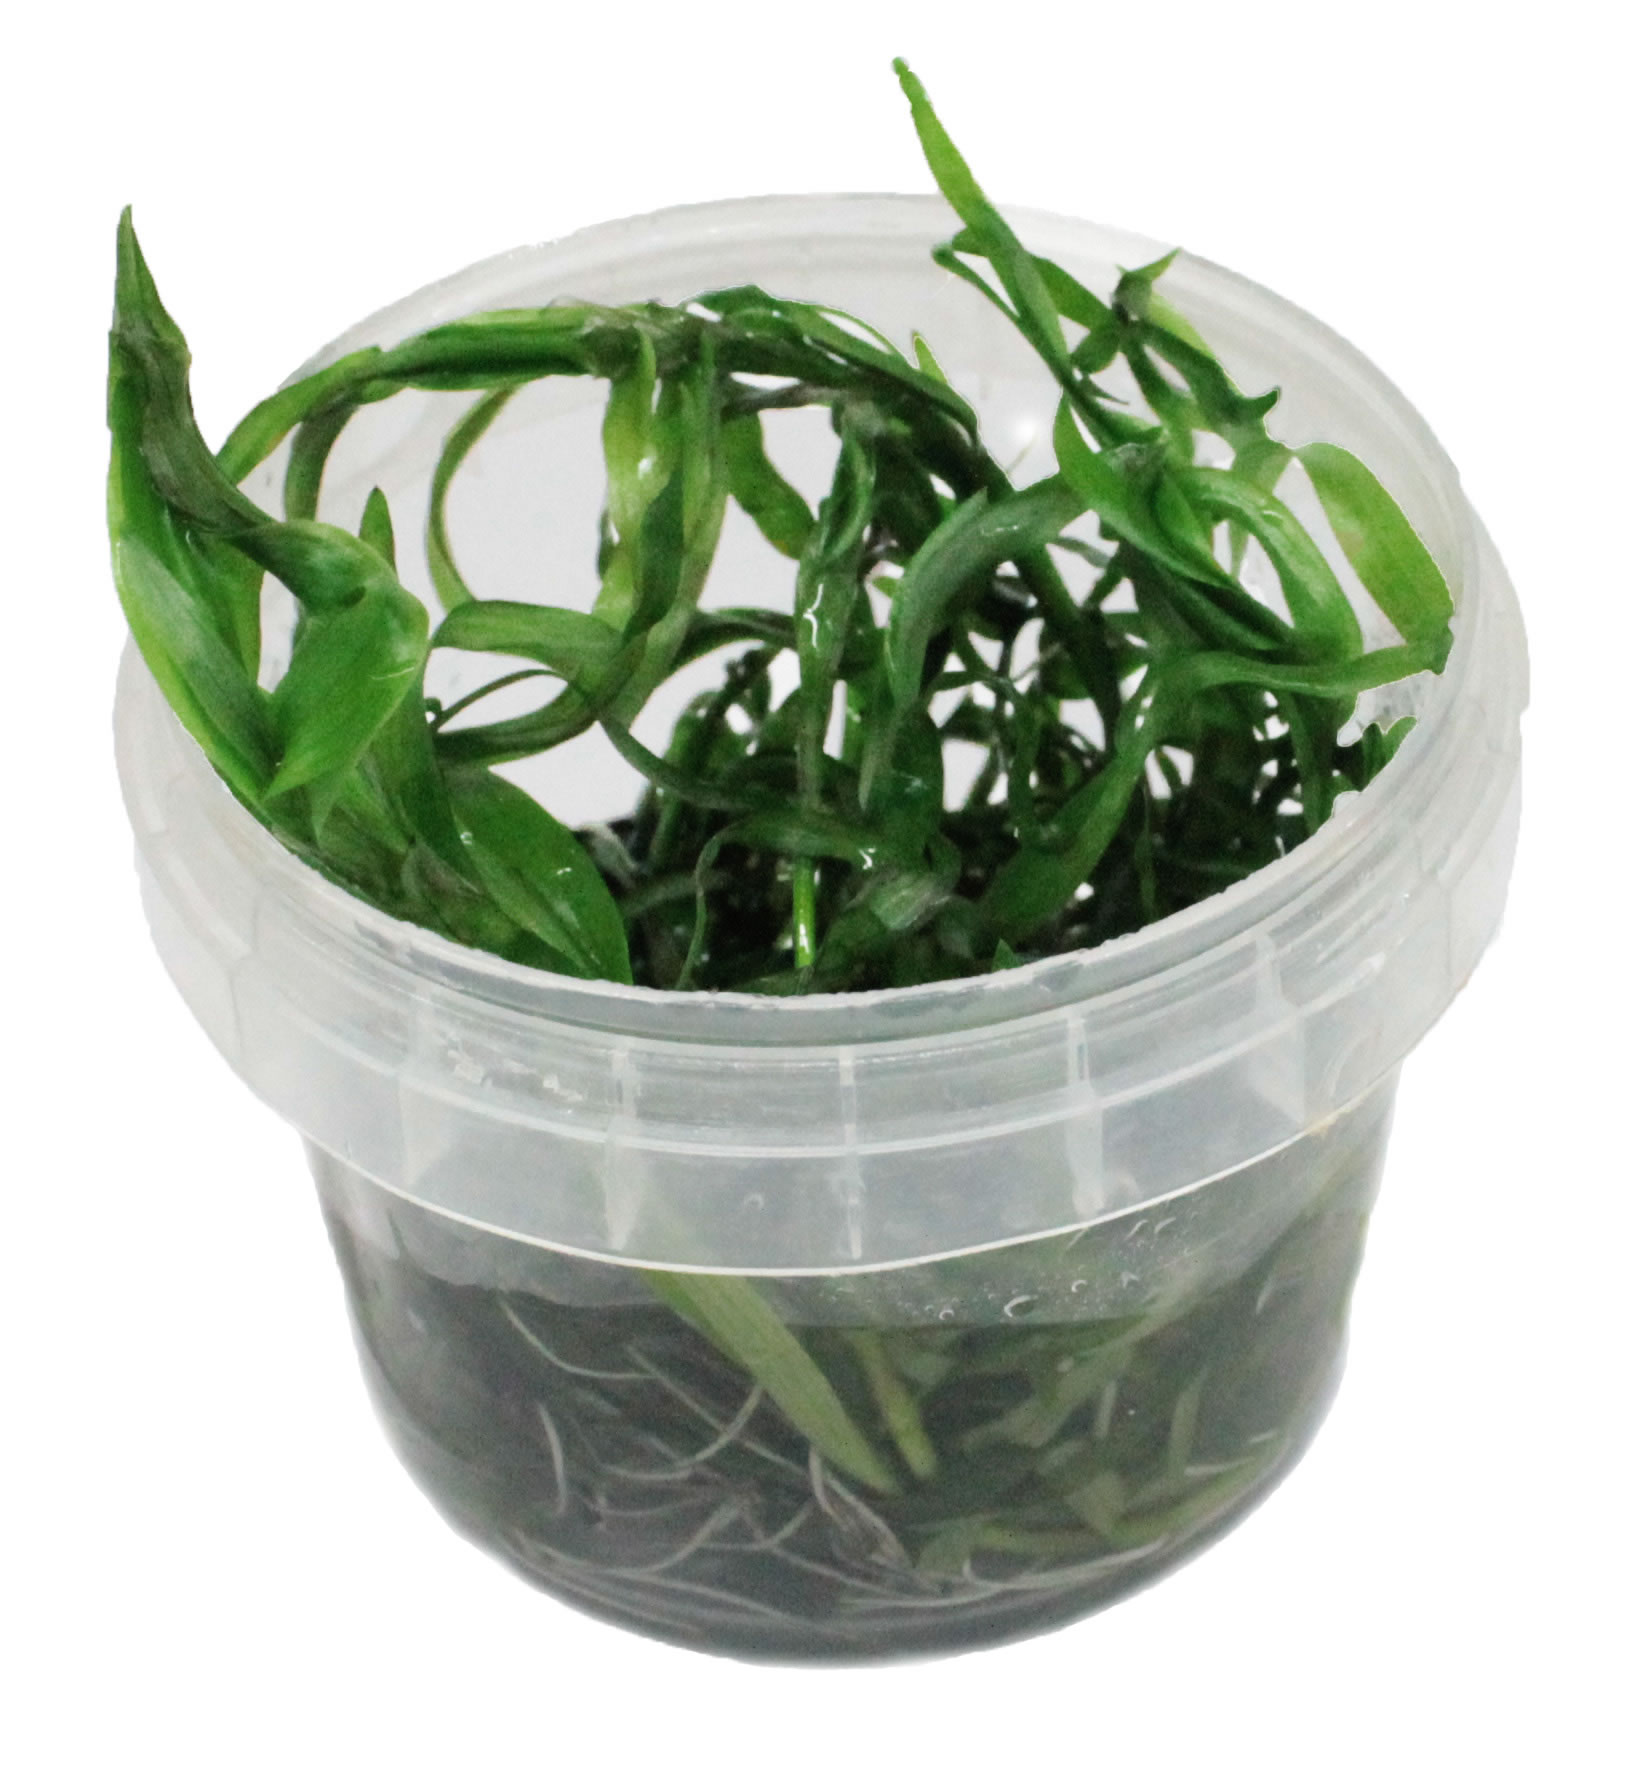 Heteranthera Zosterifolia In-Vitro Becher (aquaristic.net)